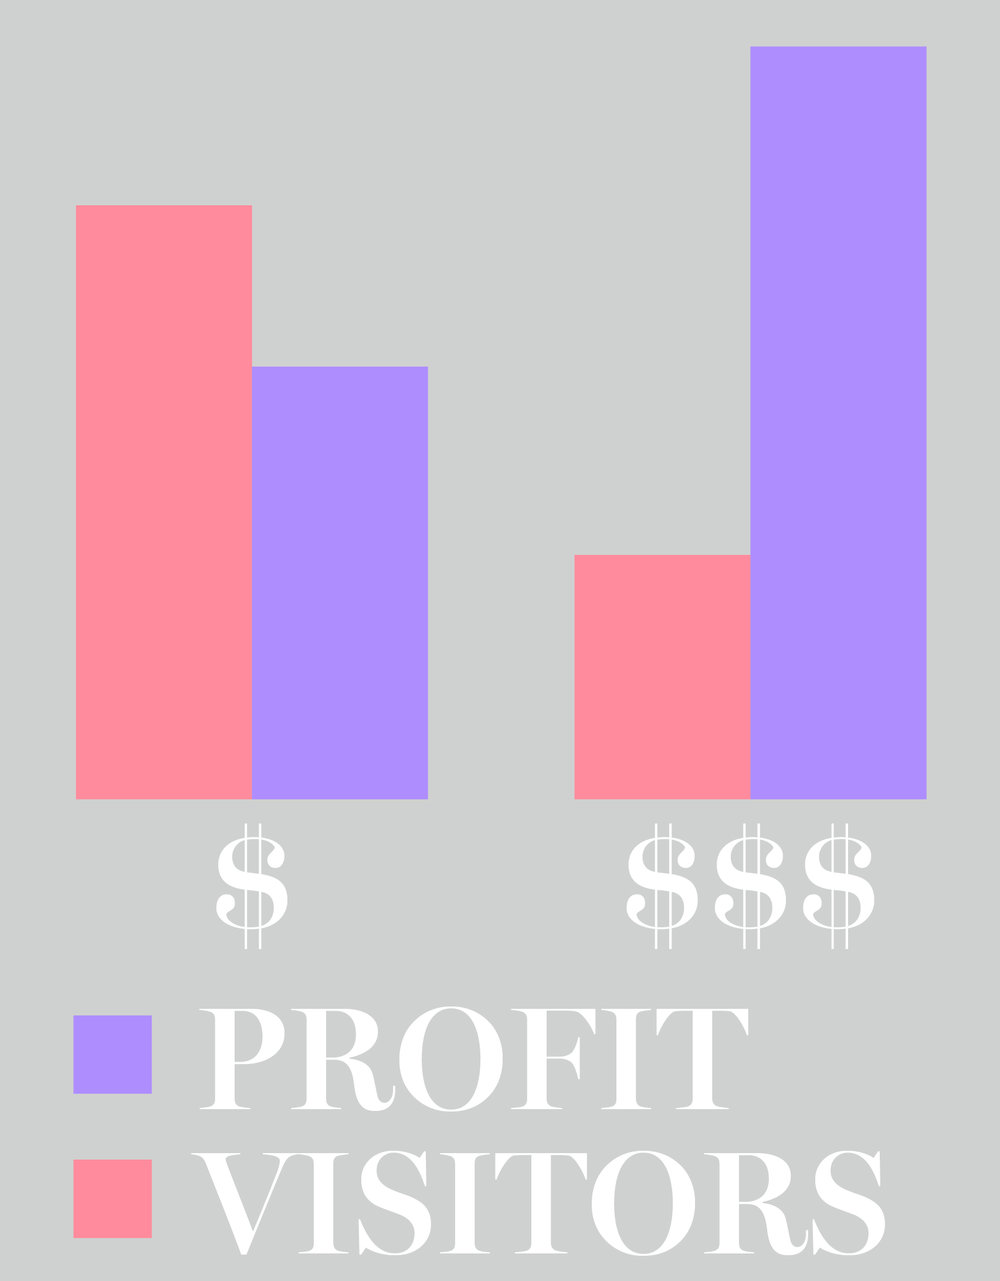 Less Clients but Better Services equals value #pricing #profit #roi